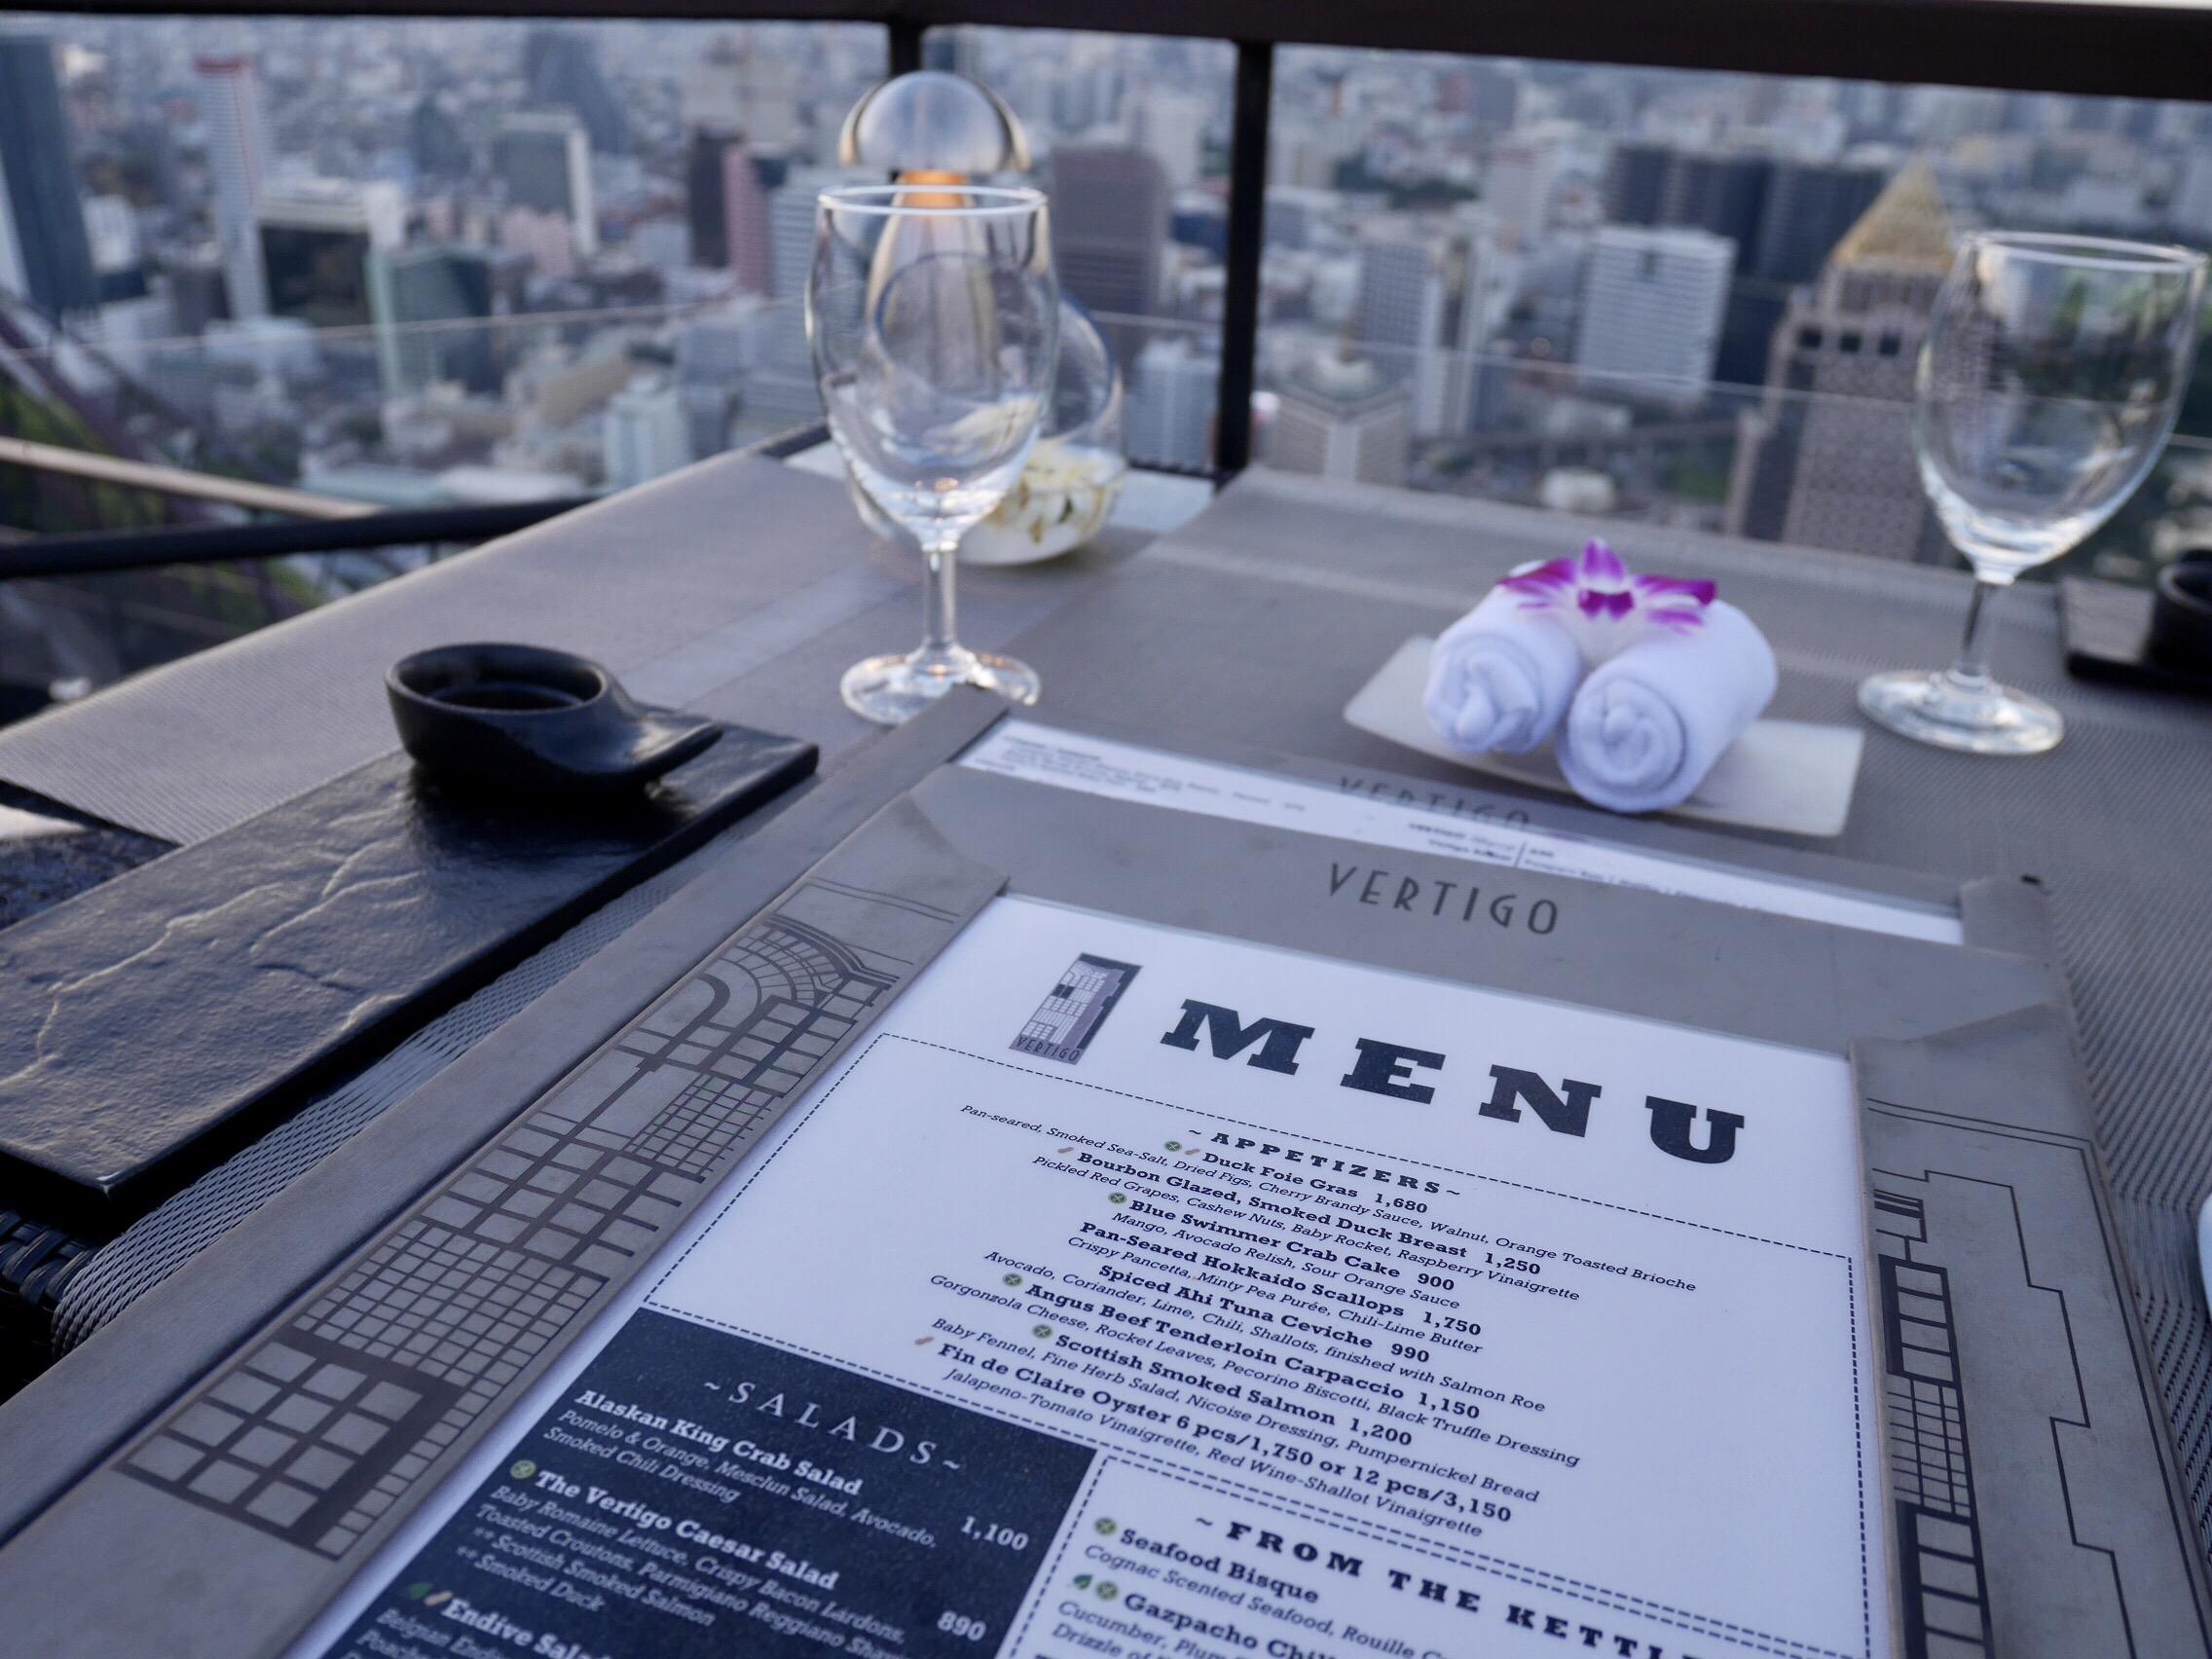 img 8289 - Banyan Tree Bangkok - 61階のルーフトップレストランVertigoで過ごす贅沢ディナータイム